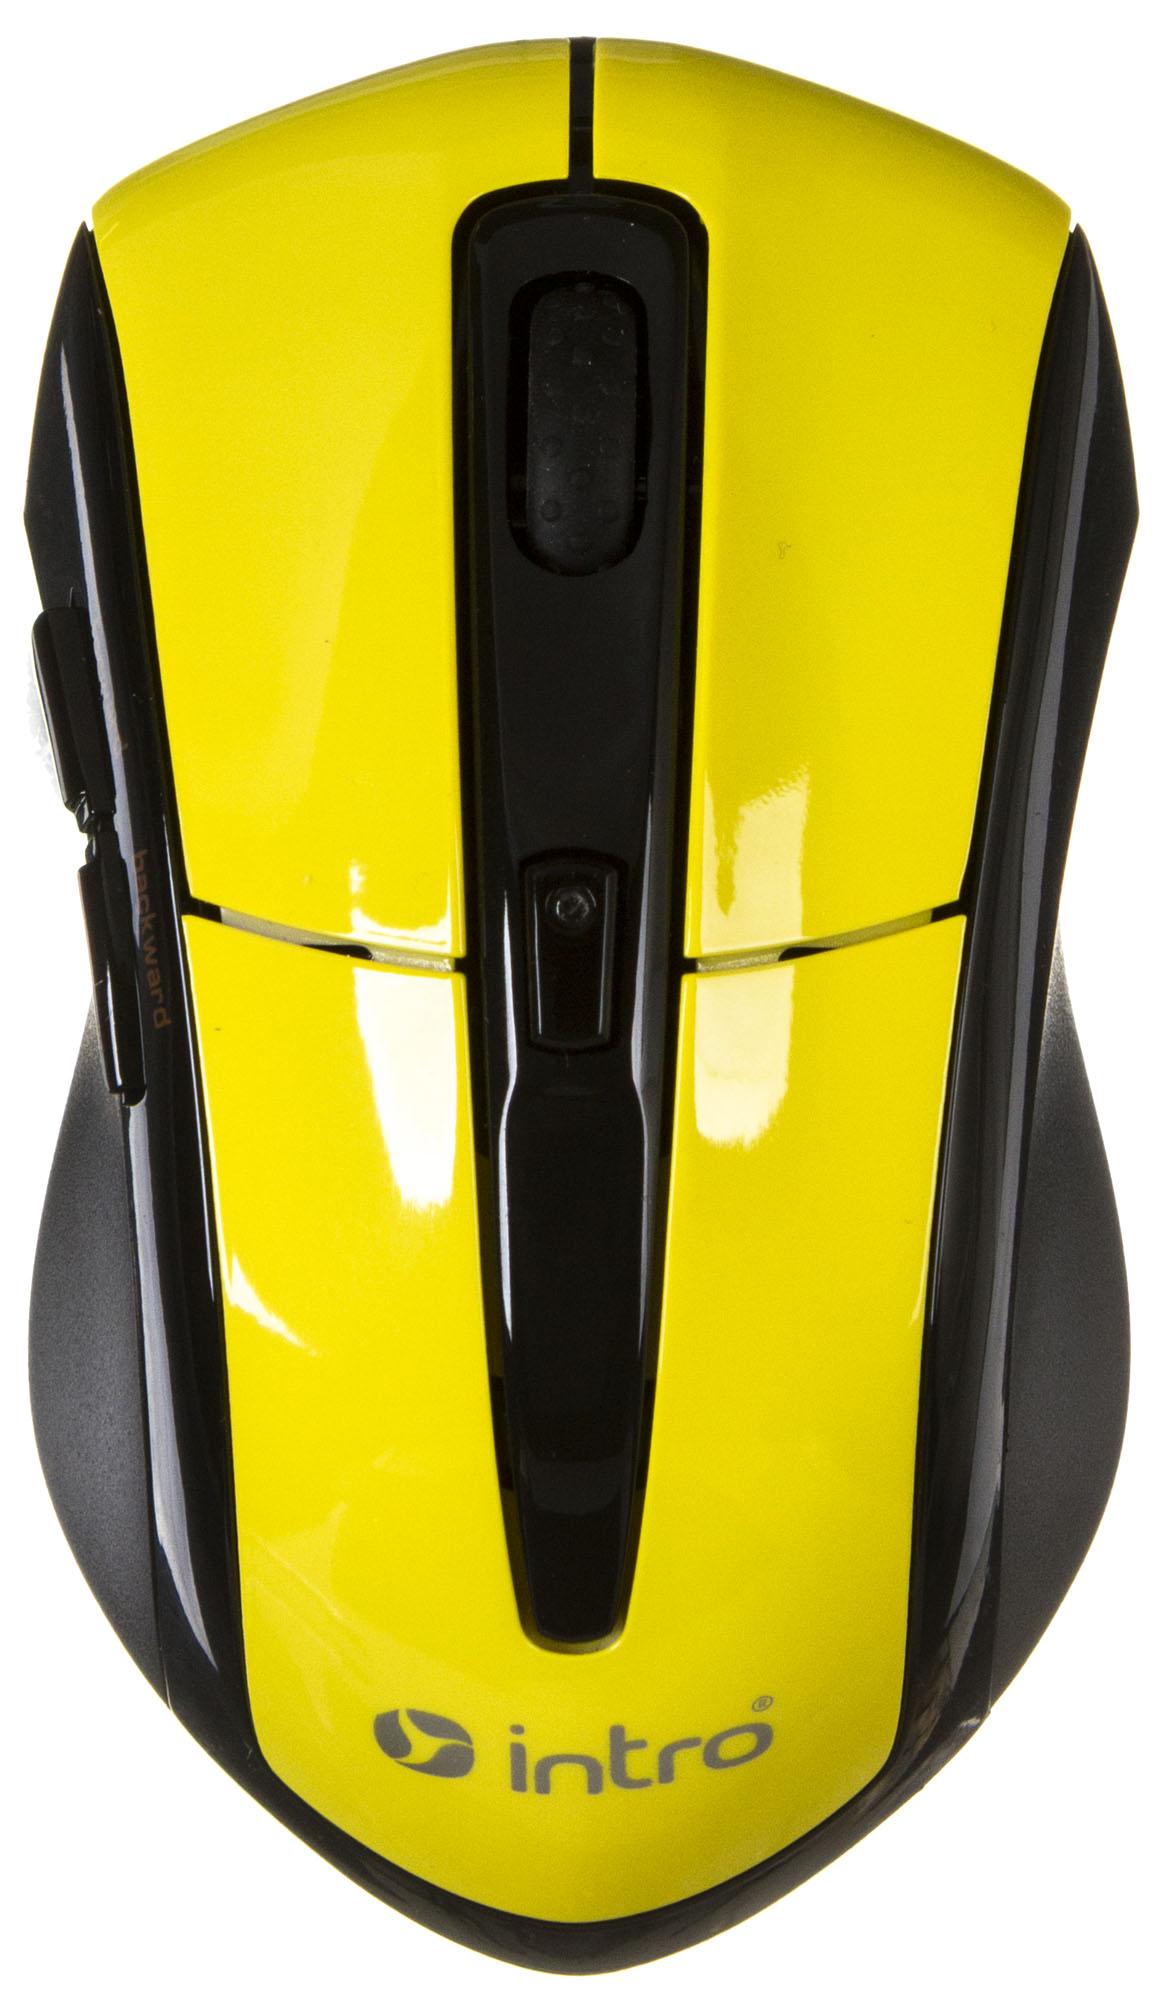 Компьютерная мышь Intro MW207 mouse Wireless Black-Yellow USBКомпьютерные мыши<br><br>